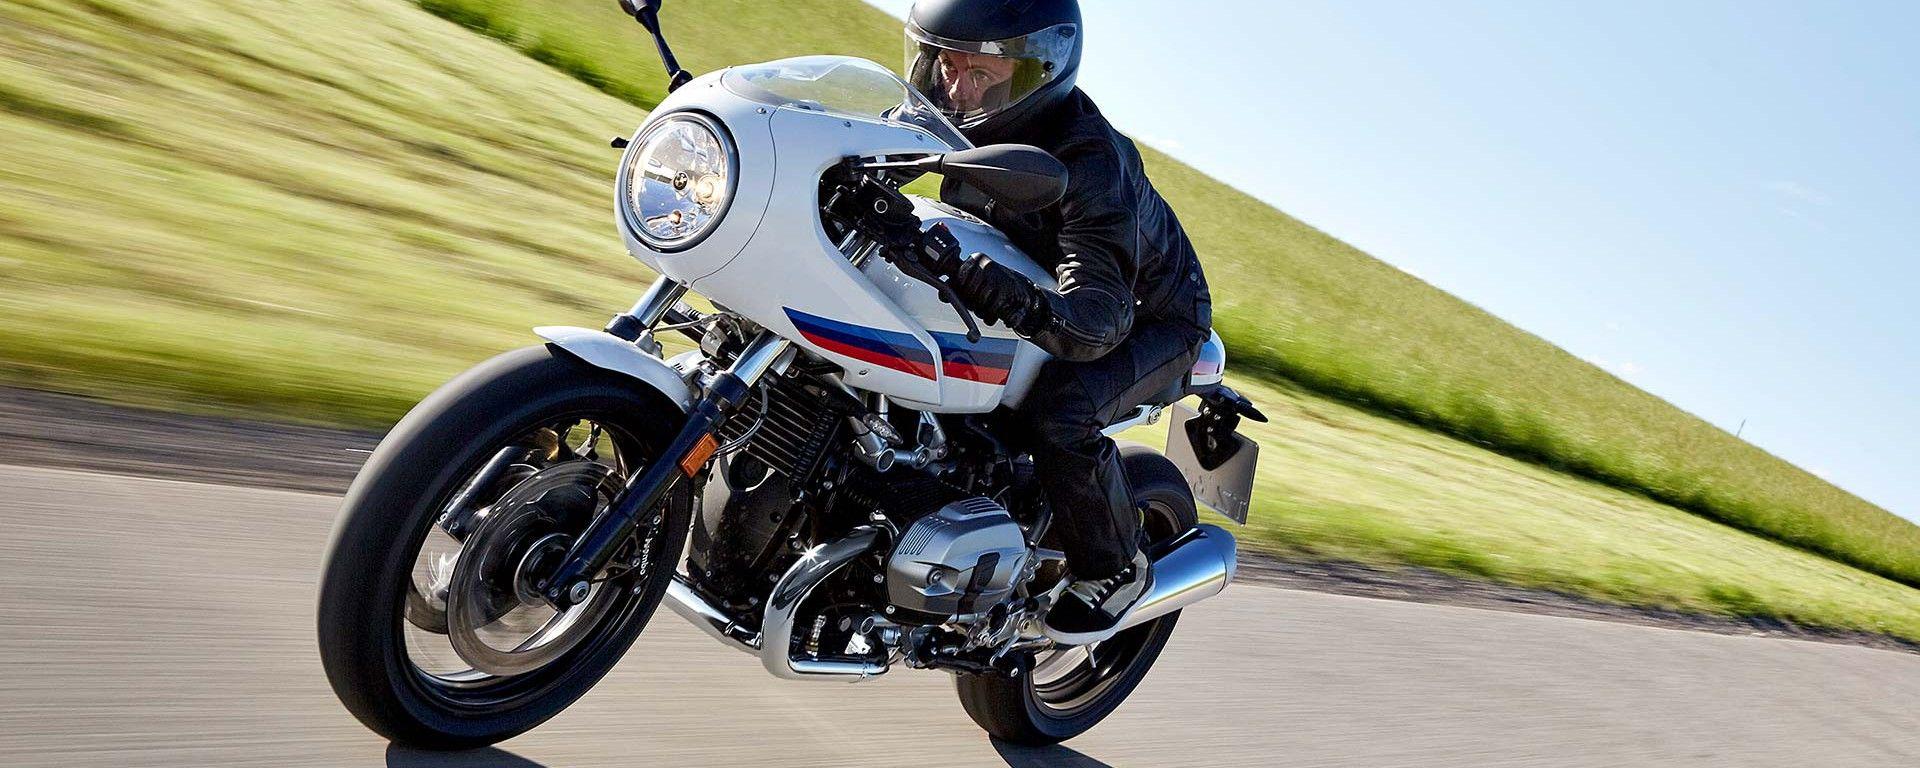 BMW R NineT Racer a Intermot 2016